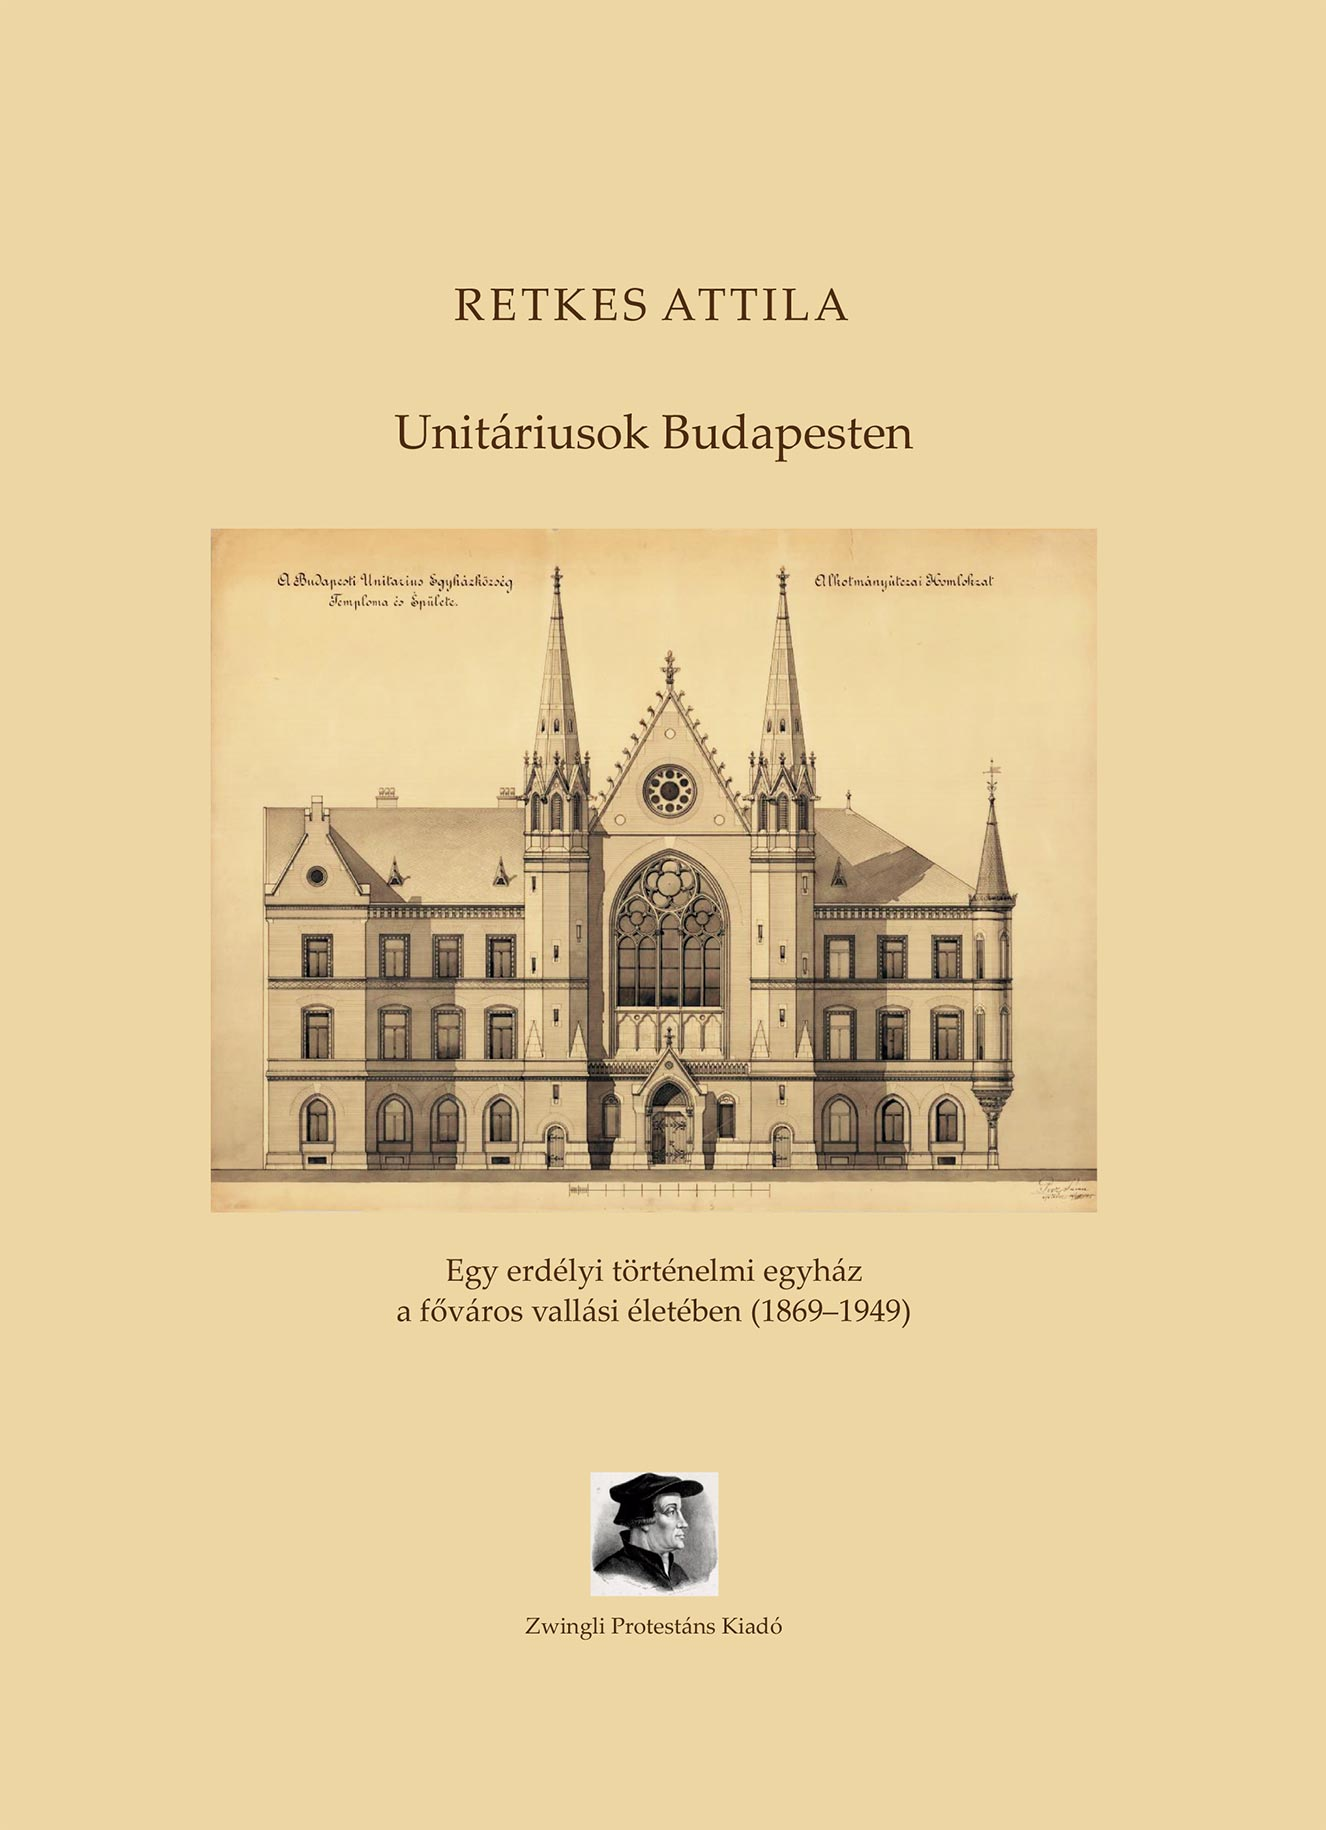 Retkes Attila: Unitáriusok Budapesten